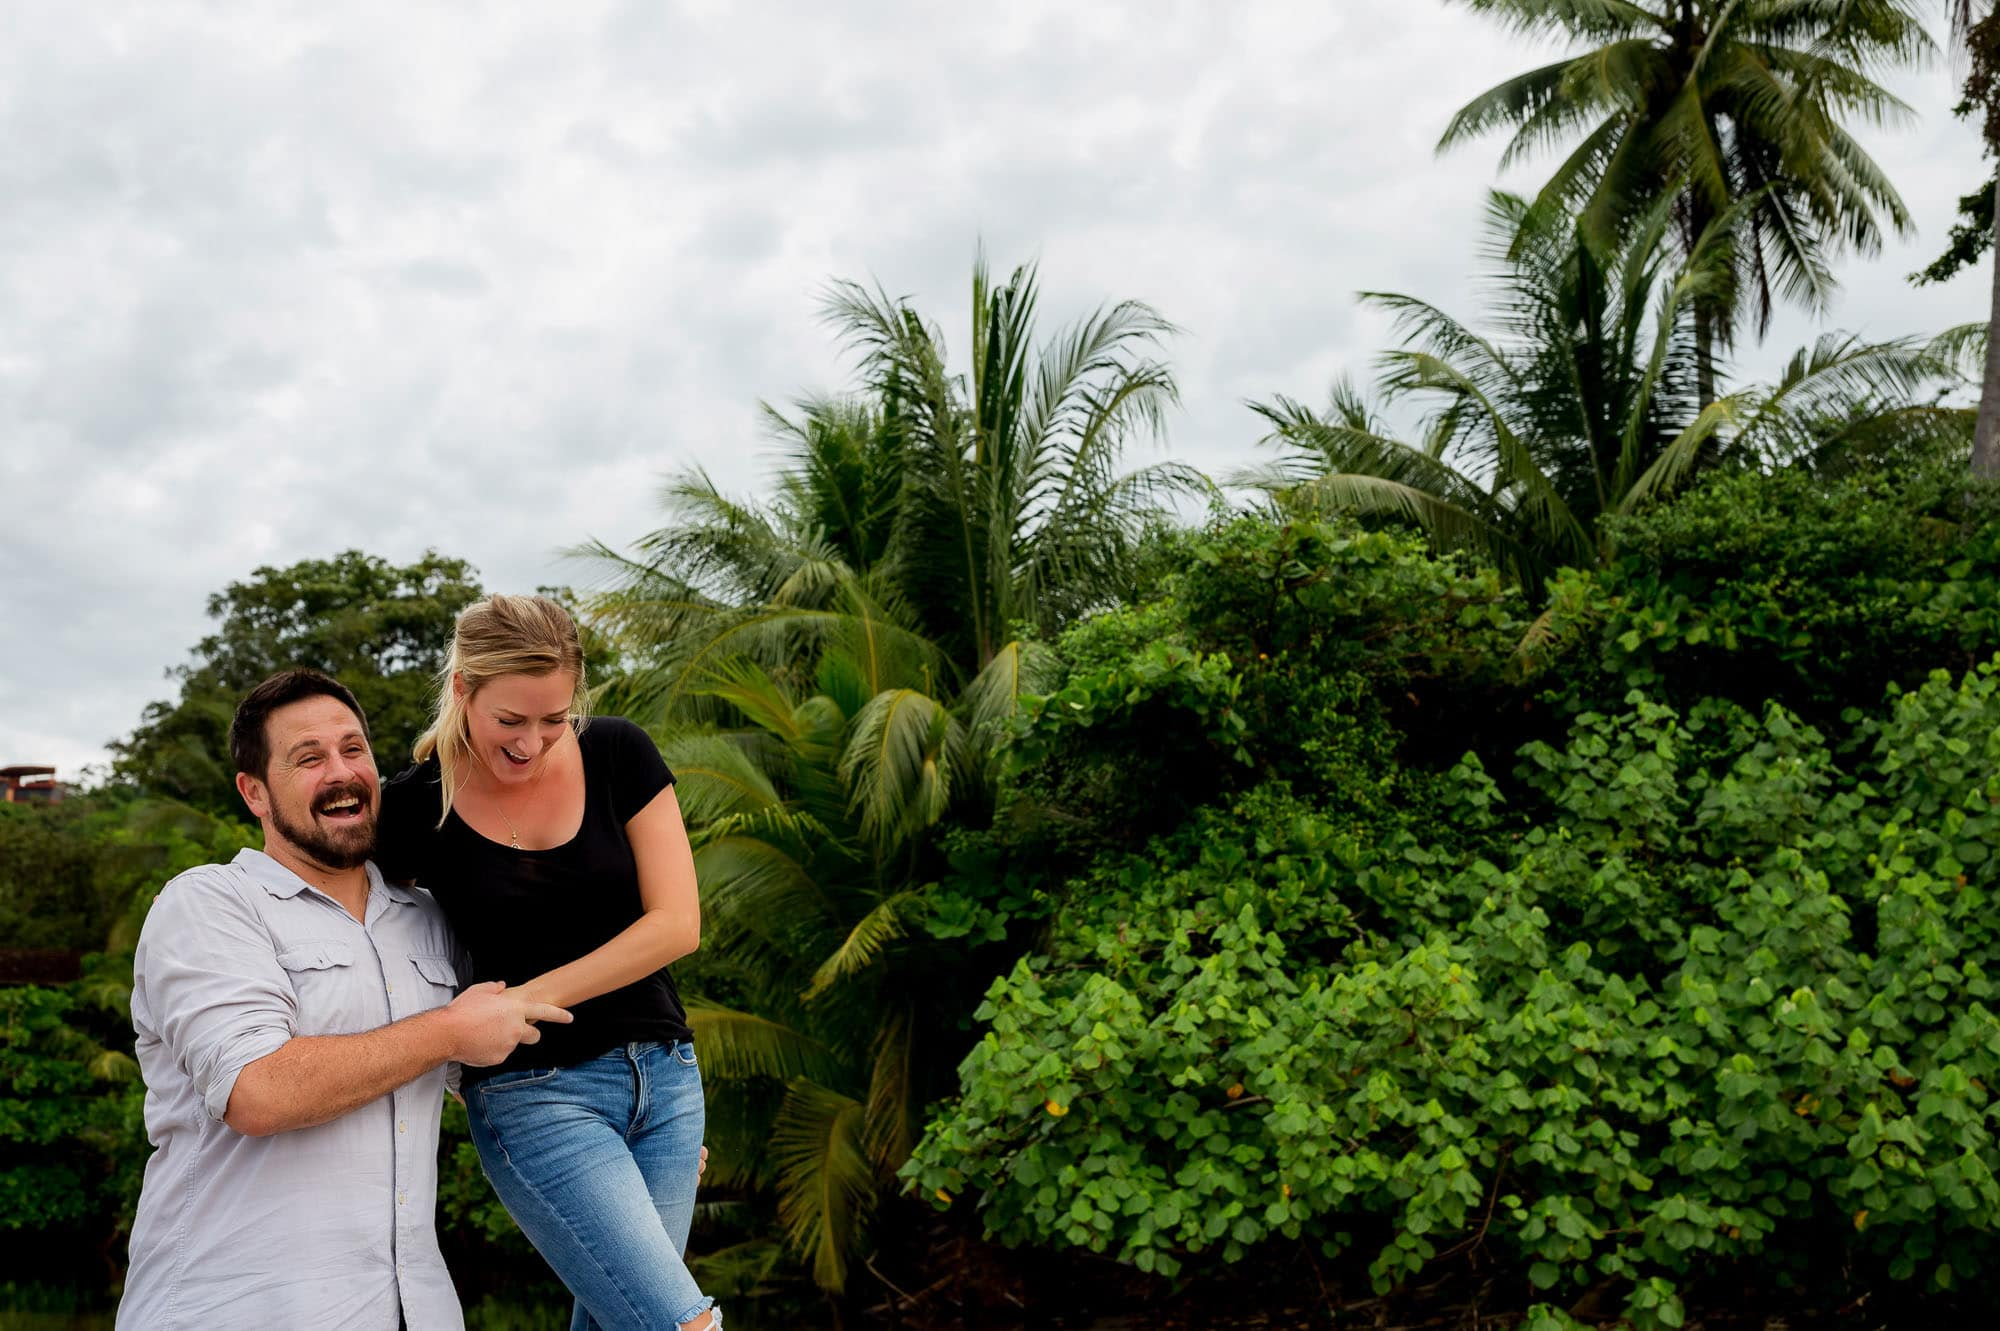 engagement photos in costa rica